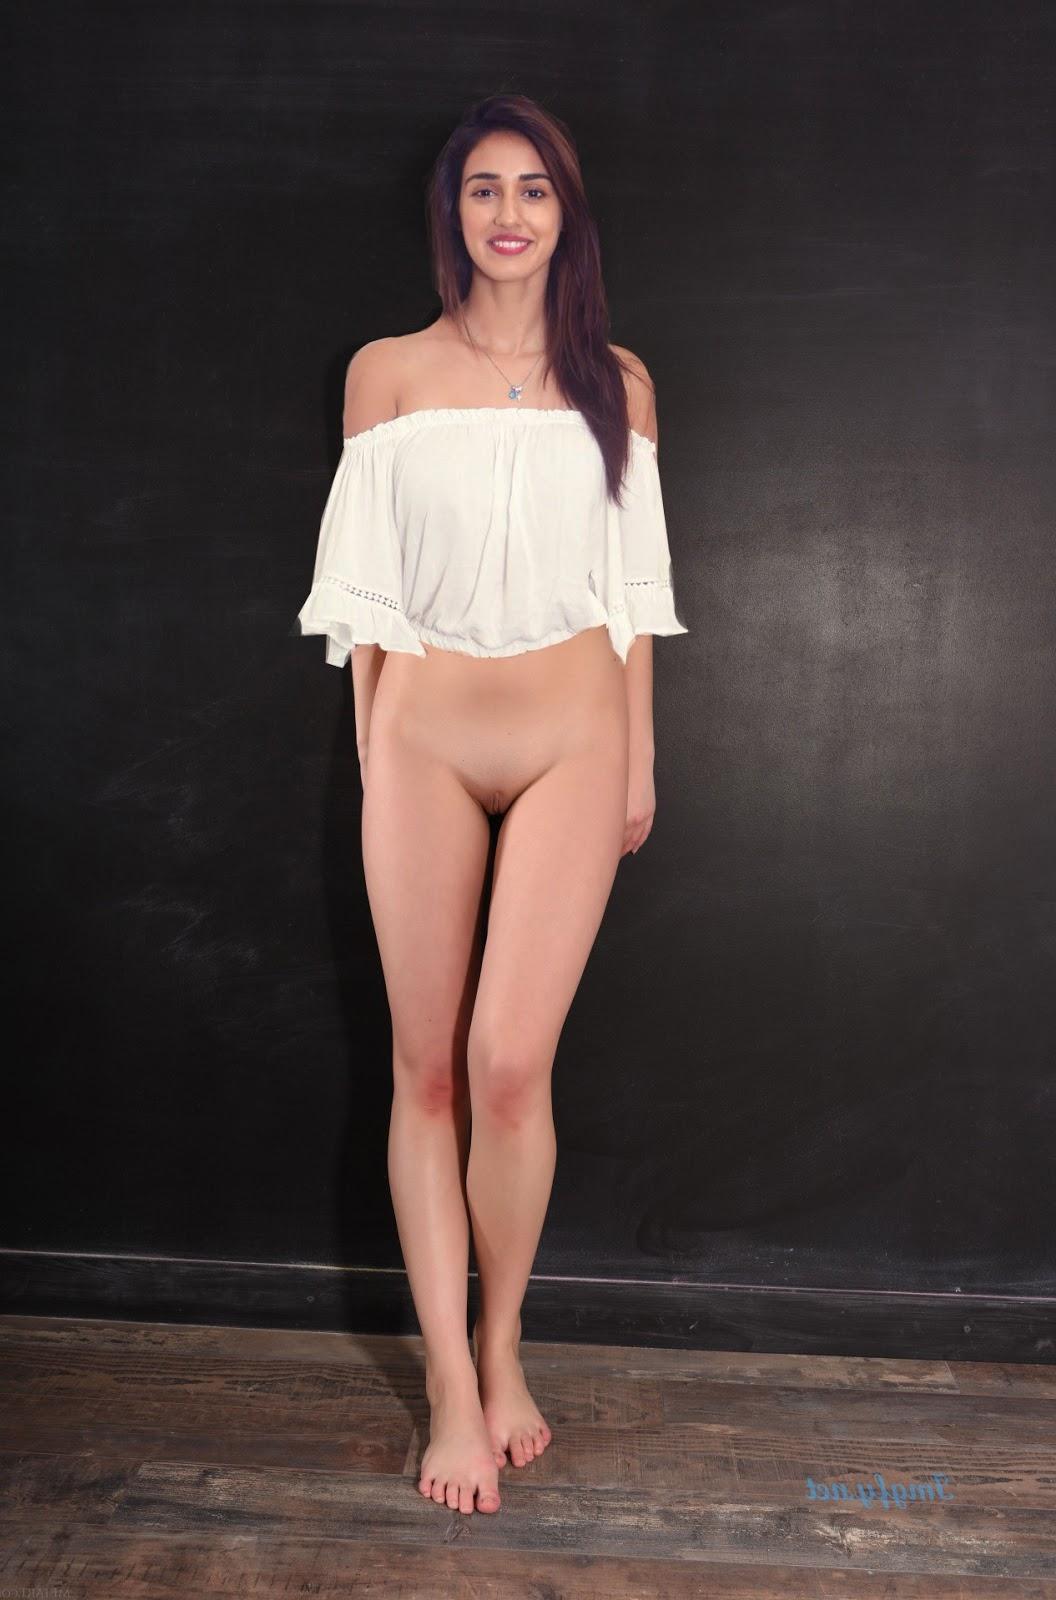 DishaPataniPussyShow - Disha Patani Nude Boobs XXX Pussy Sex Photos